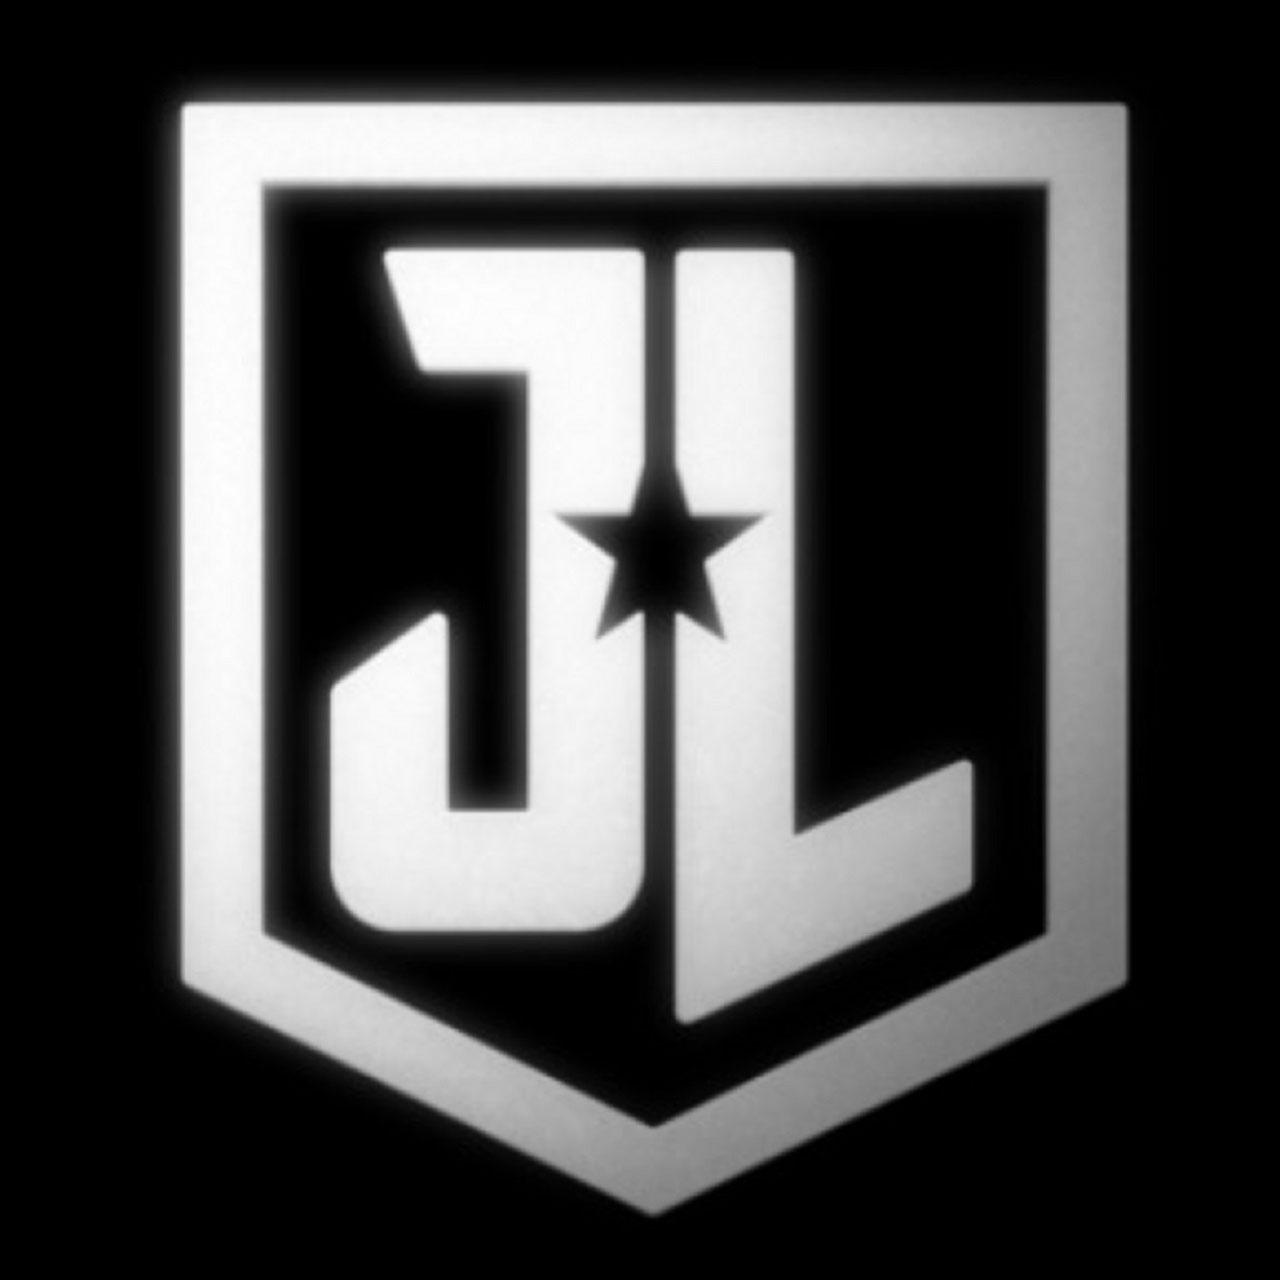 Zack-Snyder-Justice-League.jpg